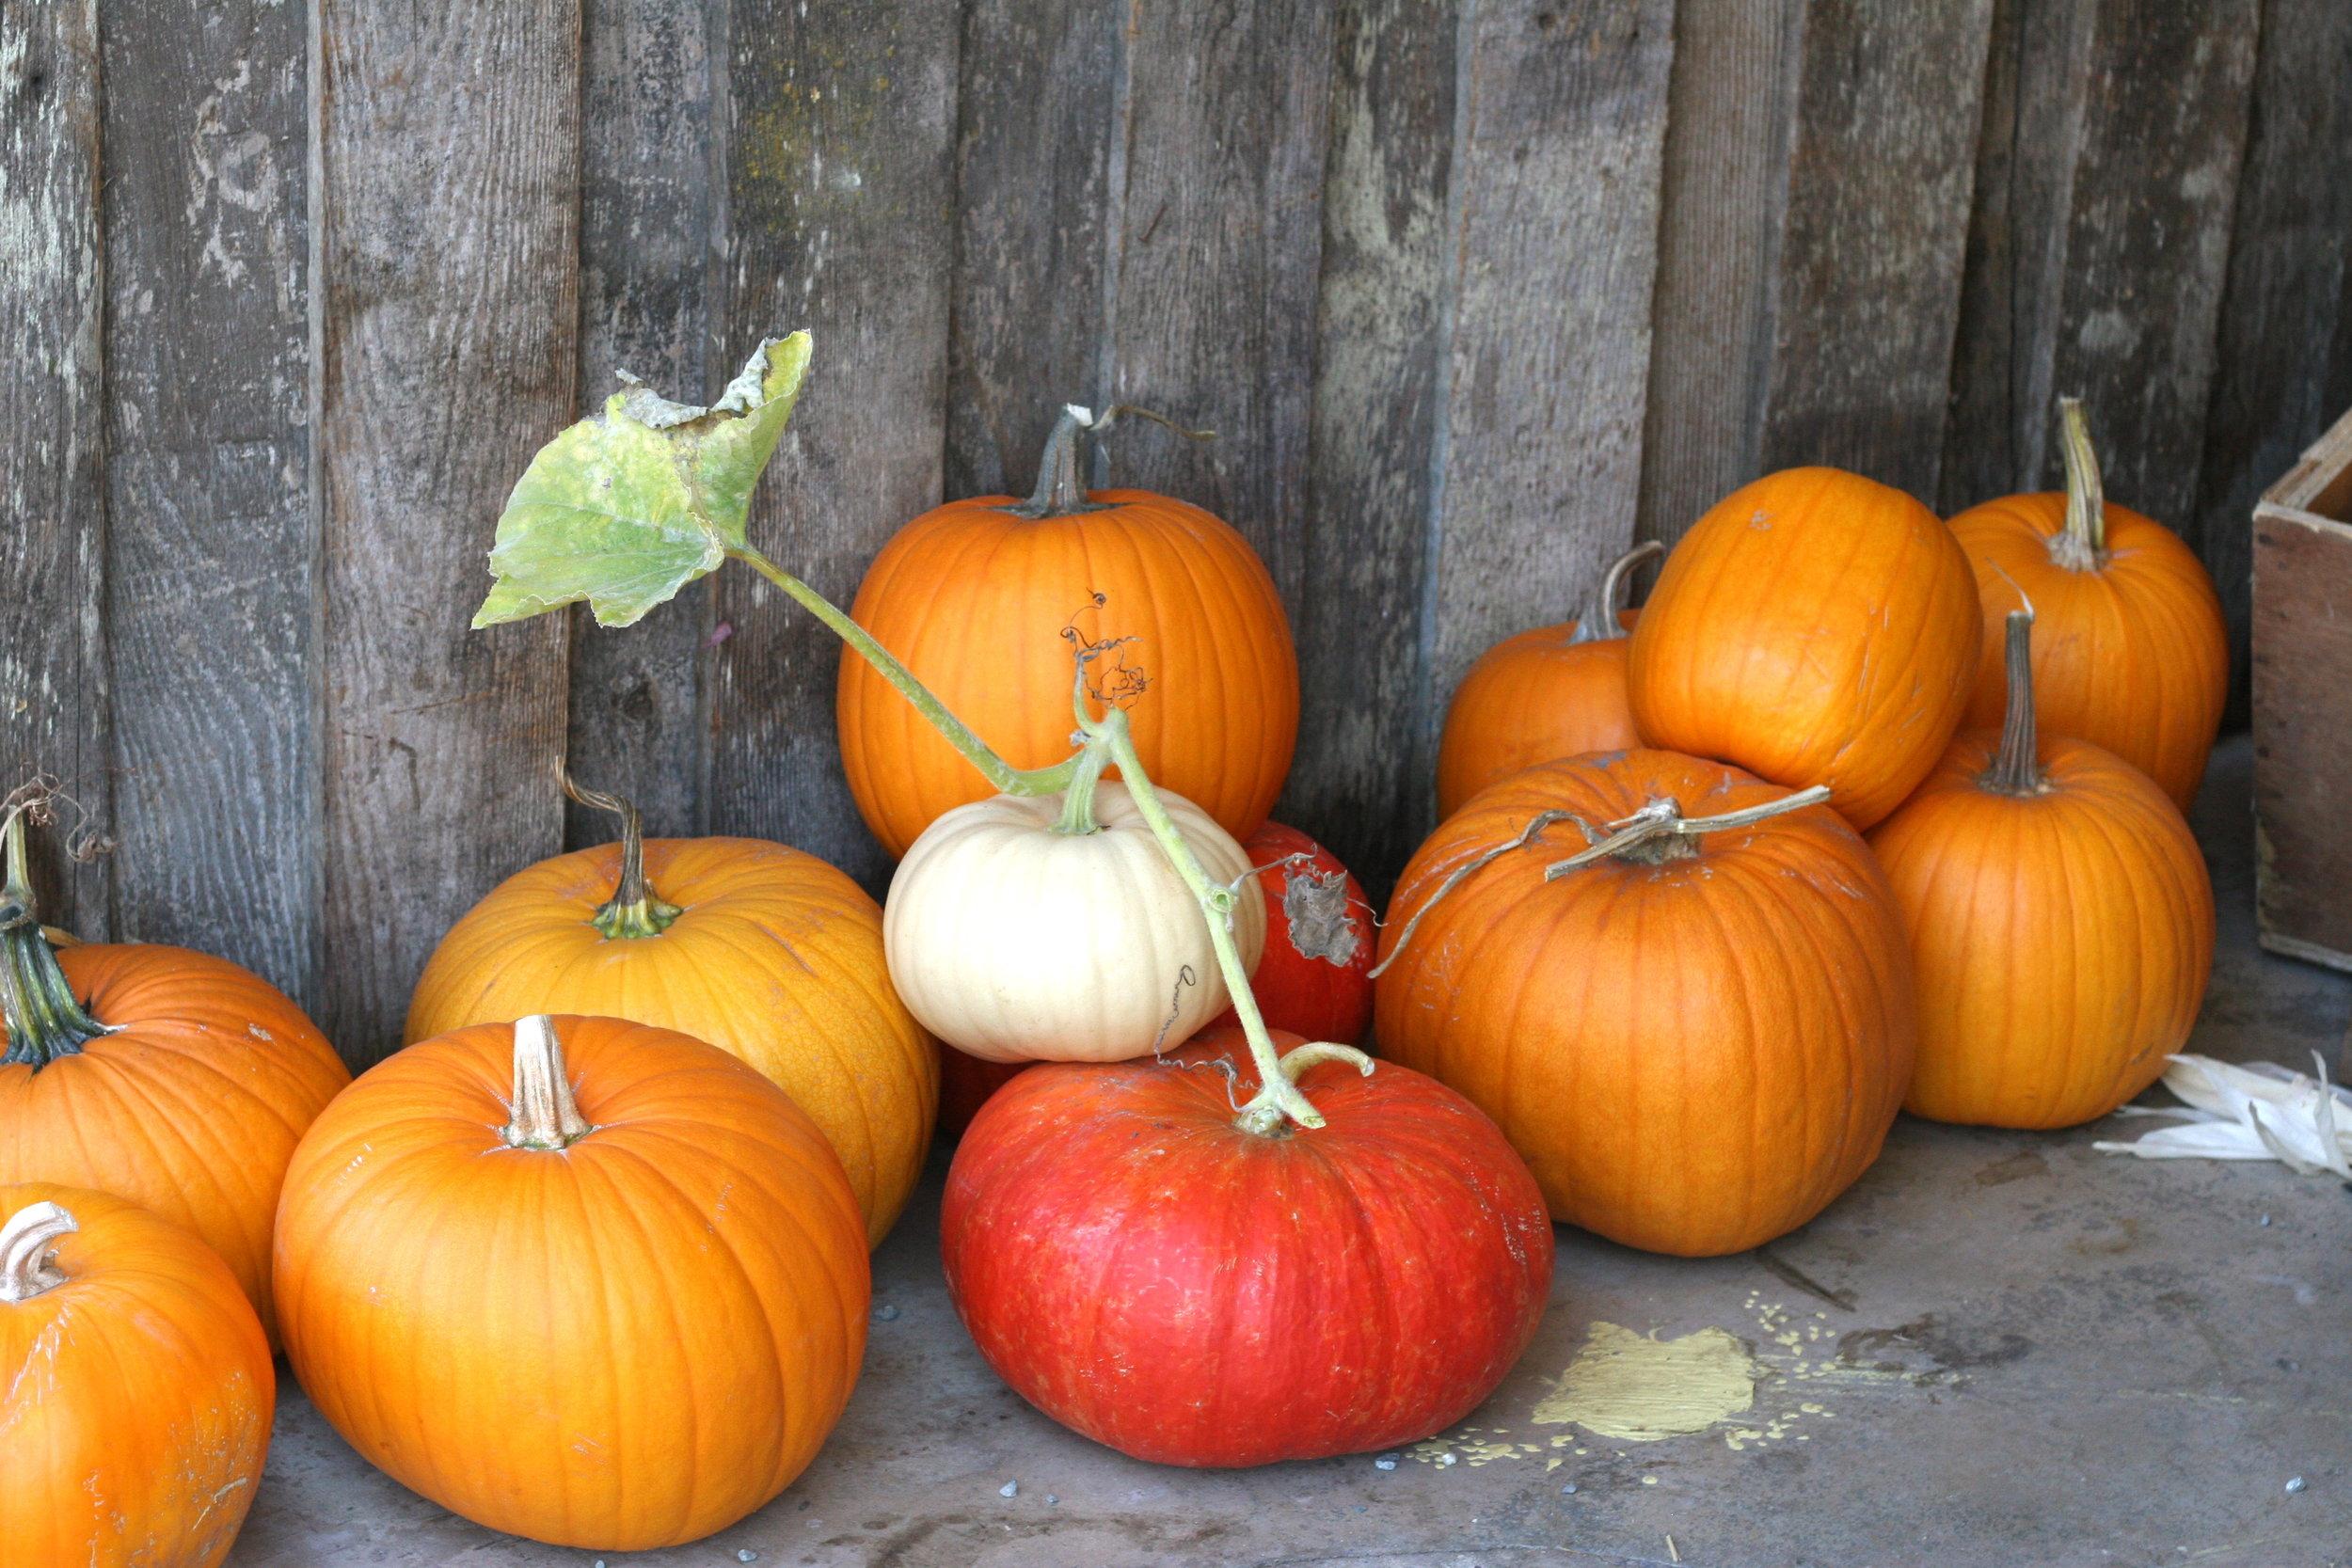 pumpkins - Sonoma Broadway Farms - Cakebloom, Sonoma, CA